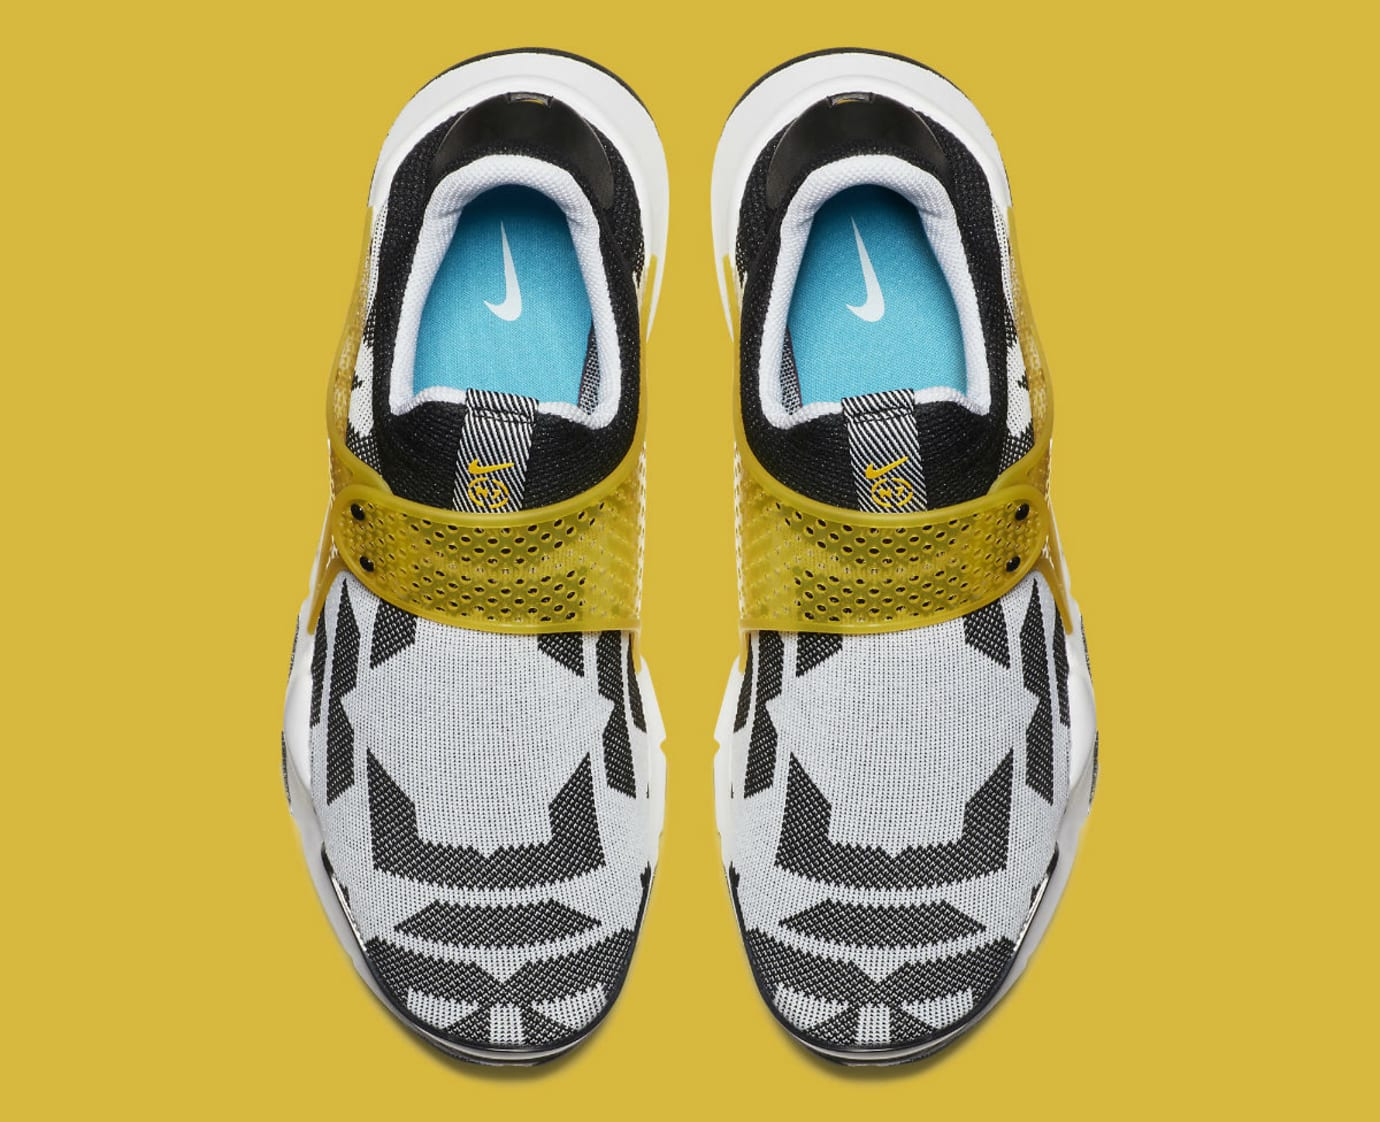 Nike N7 Sock Dart Release Date Top 908660-117